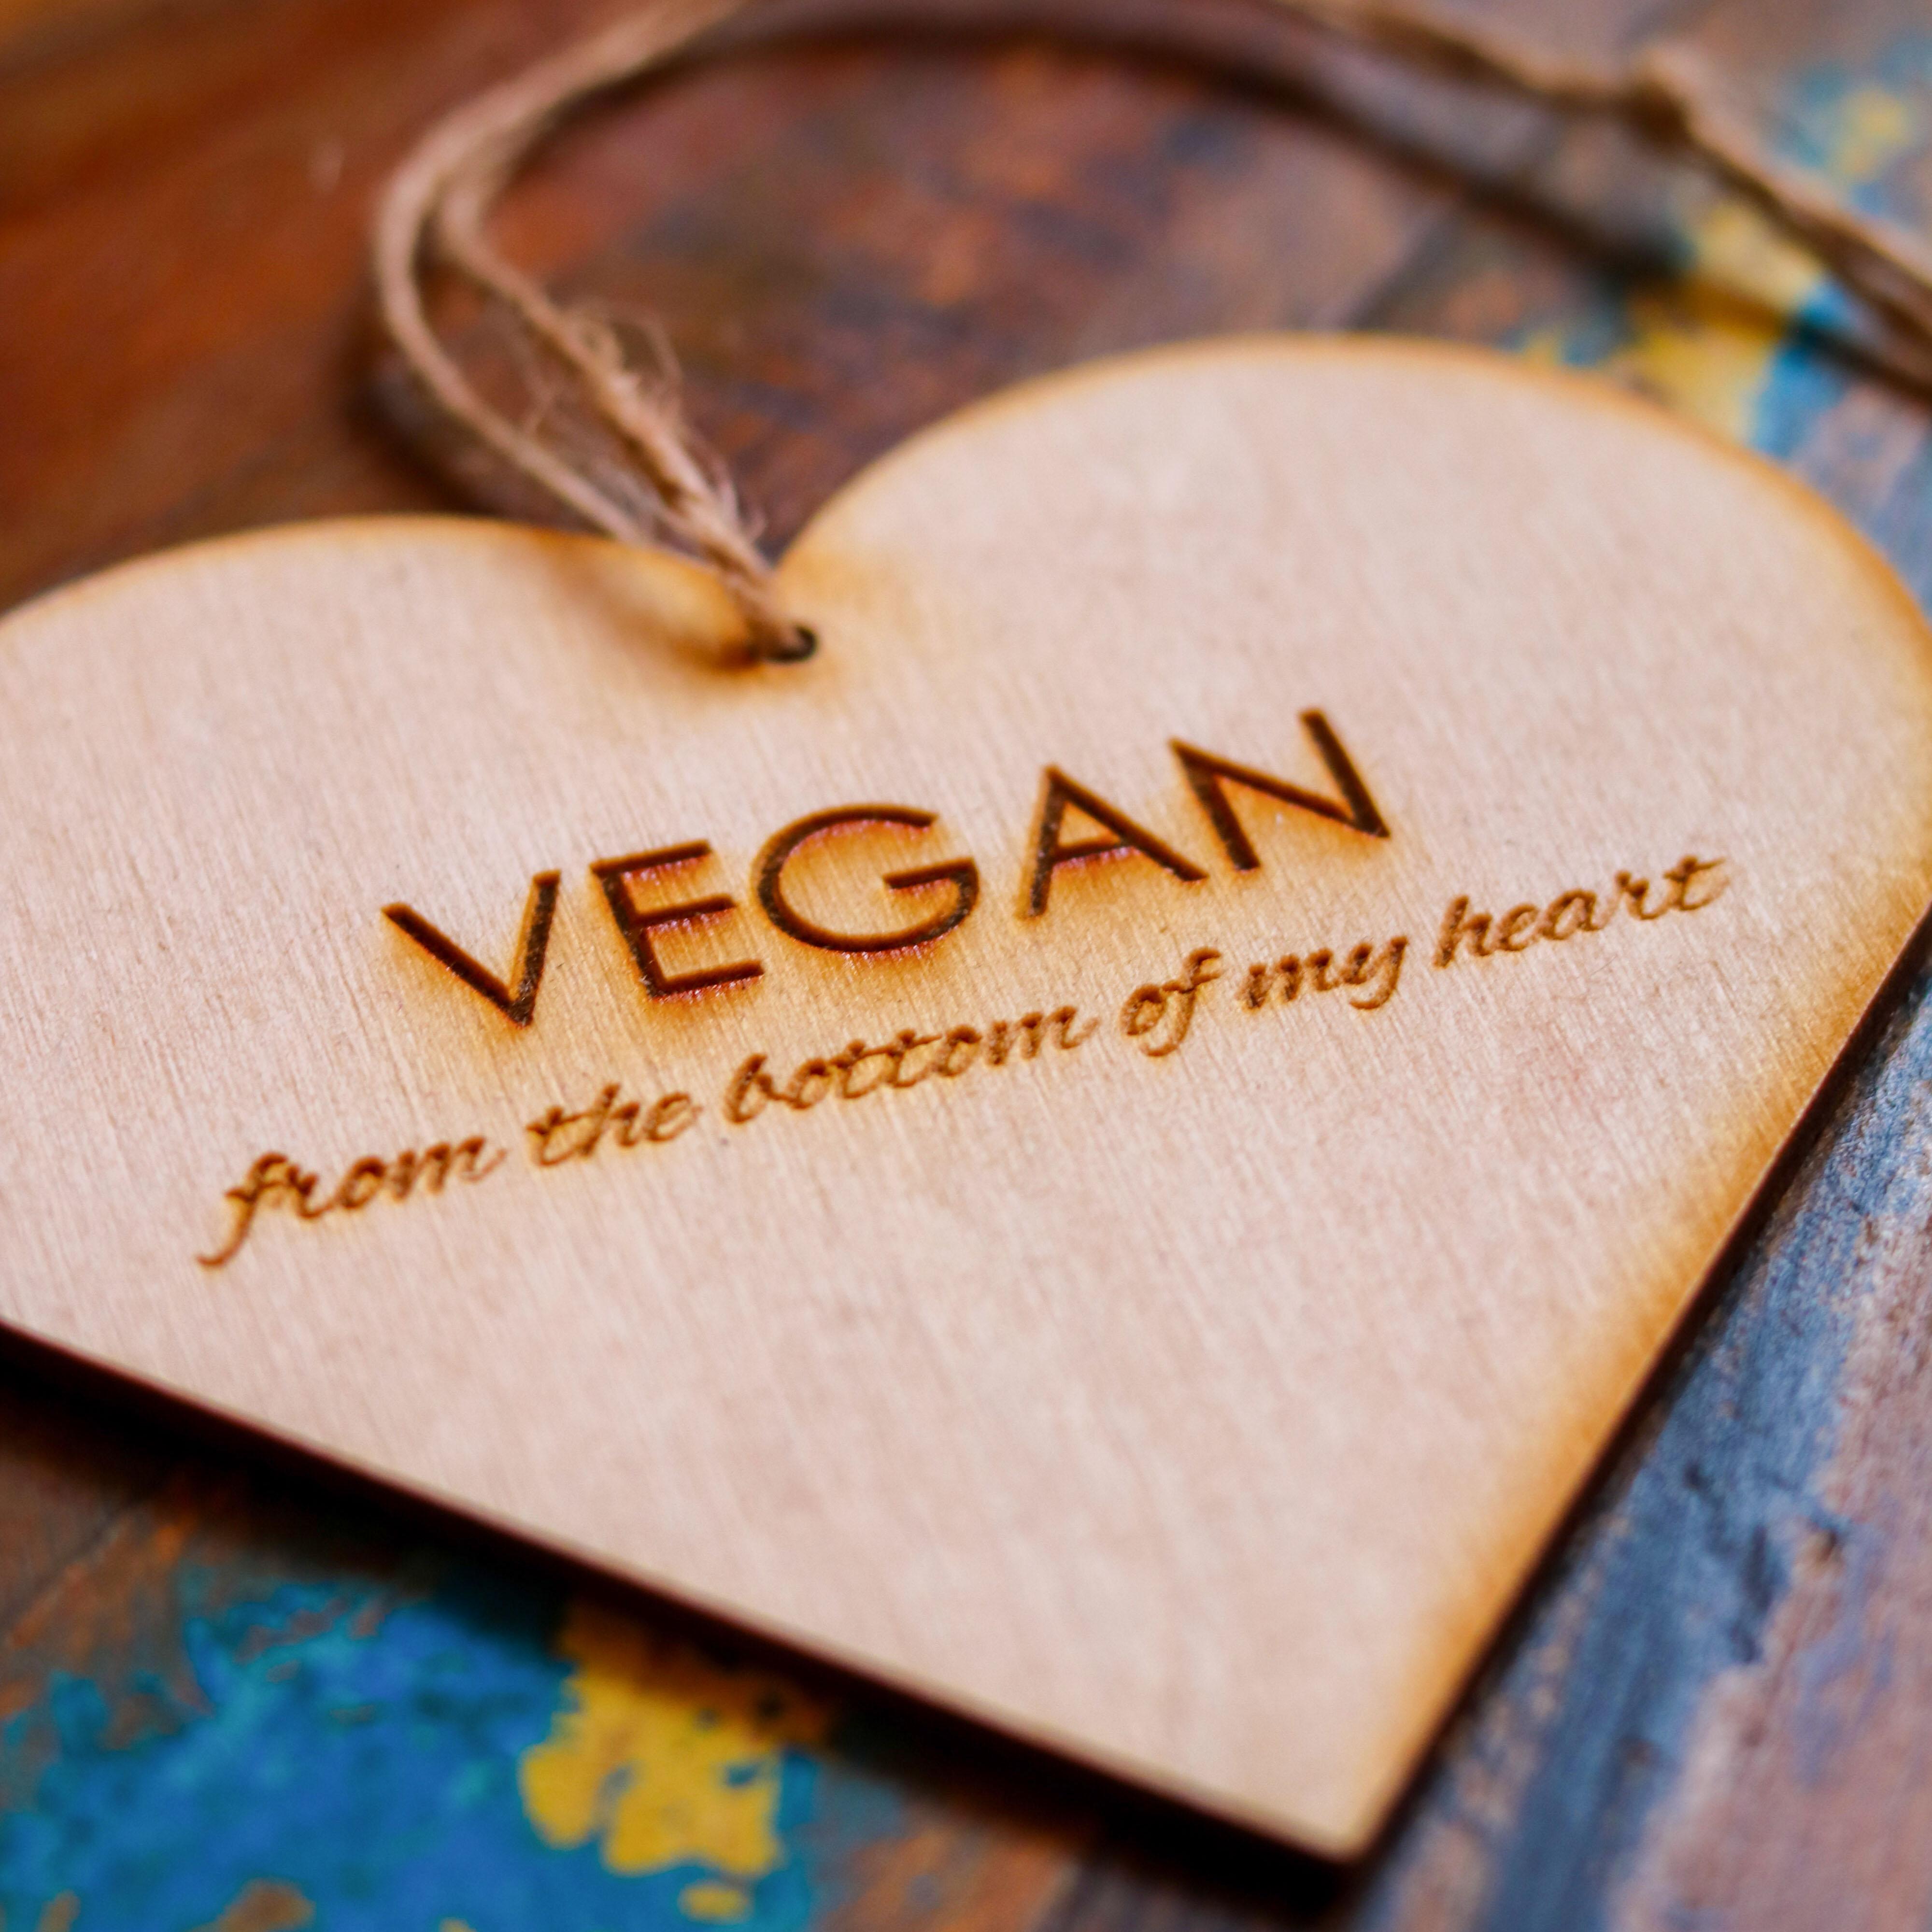 VEGAN From The Bottom Of My Heart | Vegan Heart